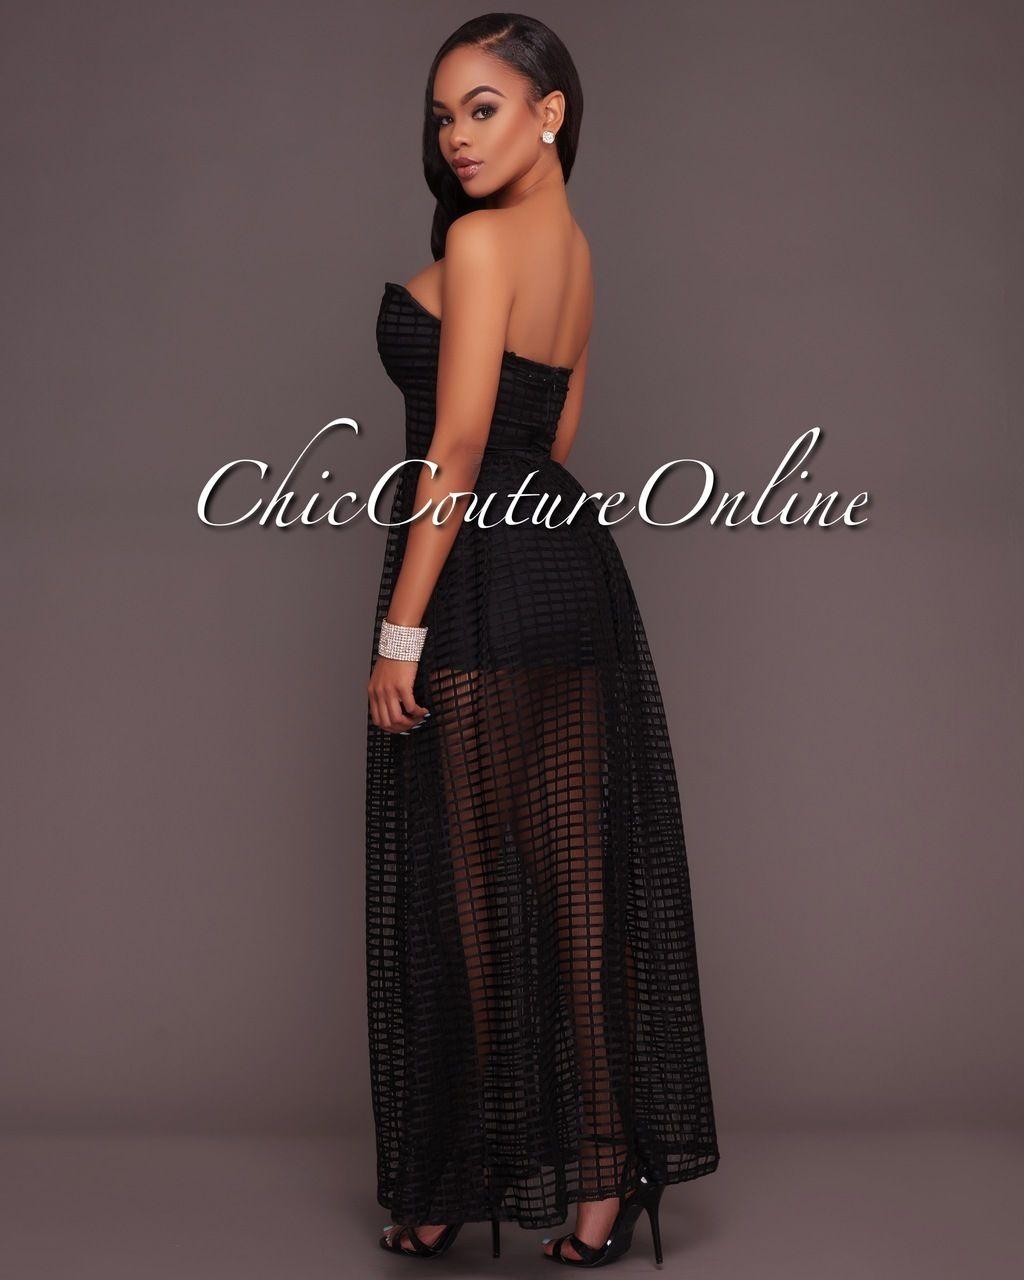 87232f1d0ab2 Chic Couture Online - Benita Black Textured Mesh Romper Maxi Dress